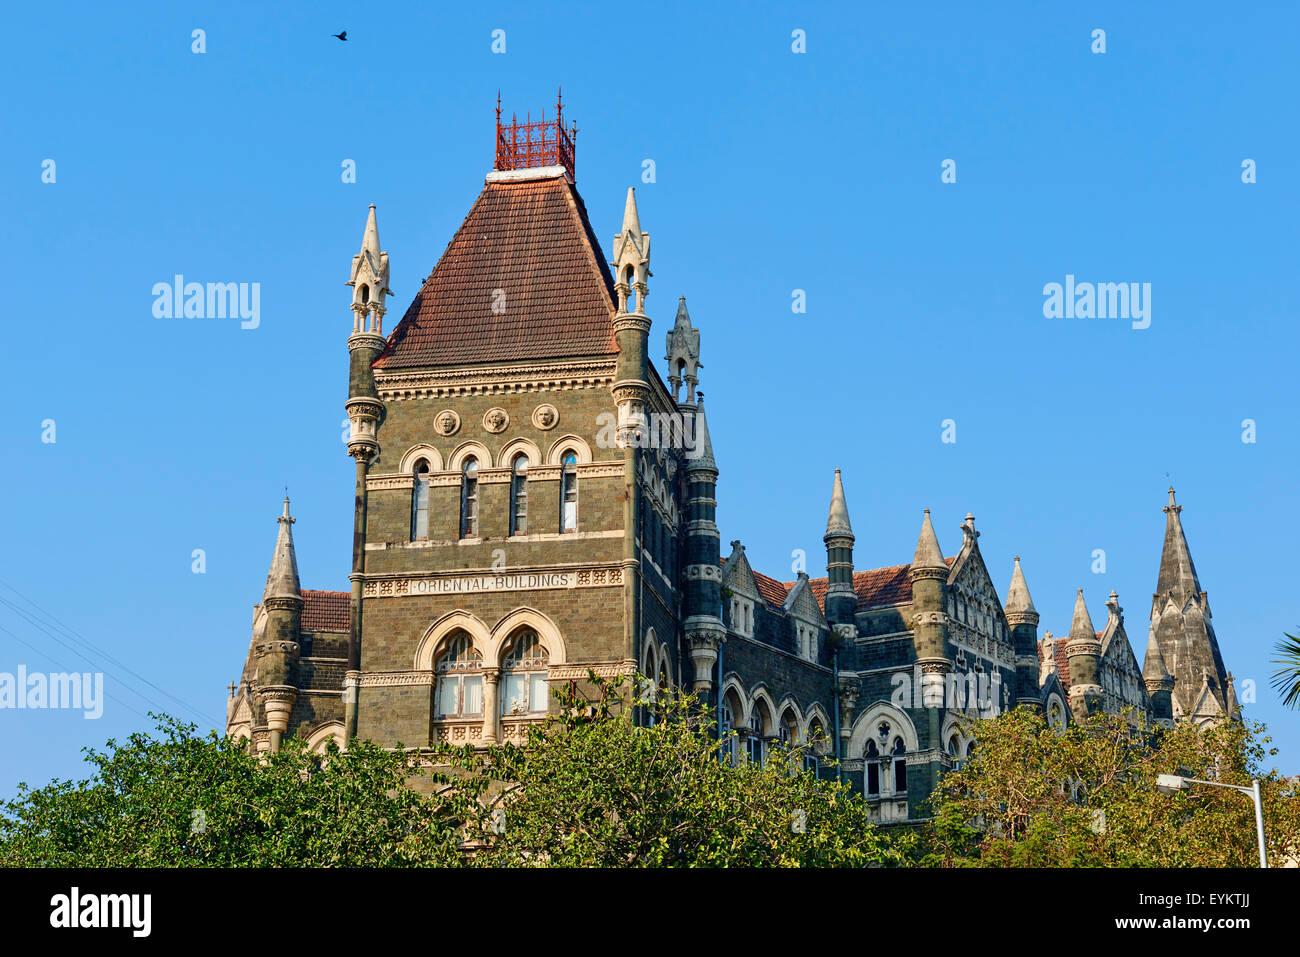 India, Maharashtra, Mumbai (Bombay), Hutatma chowk square - Stock Image